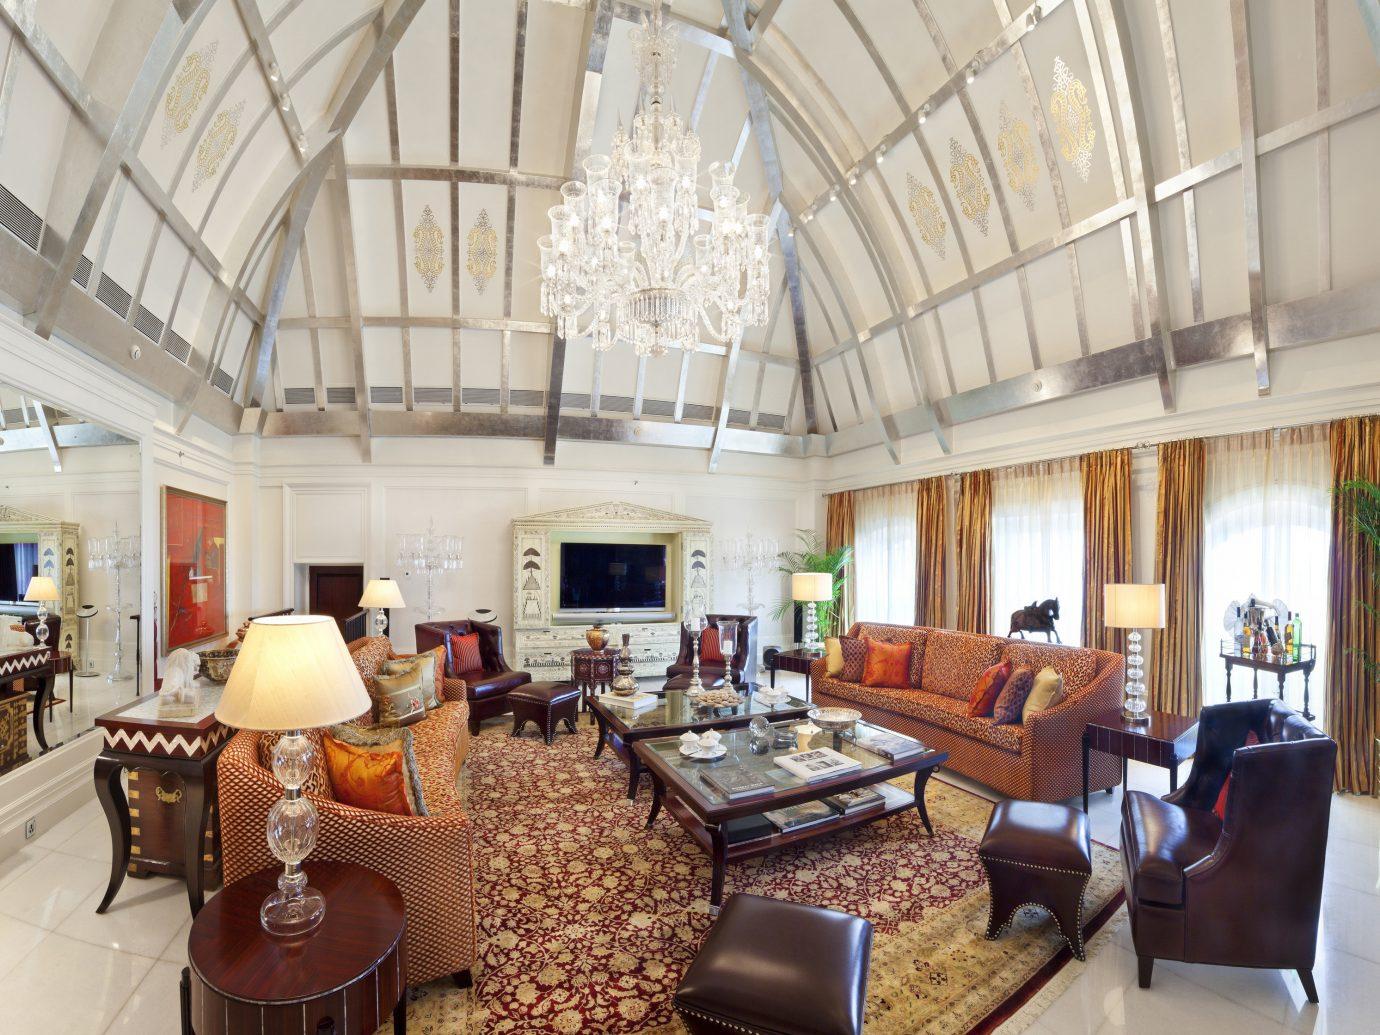 Hotels Luxury Travel indoor room Living ceiling living room interior design real estate estate loft penthouse apartment furniture area